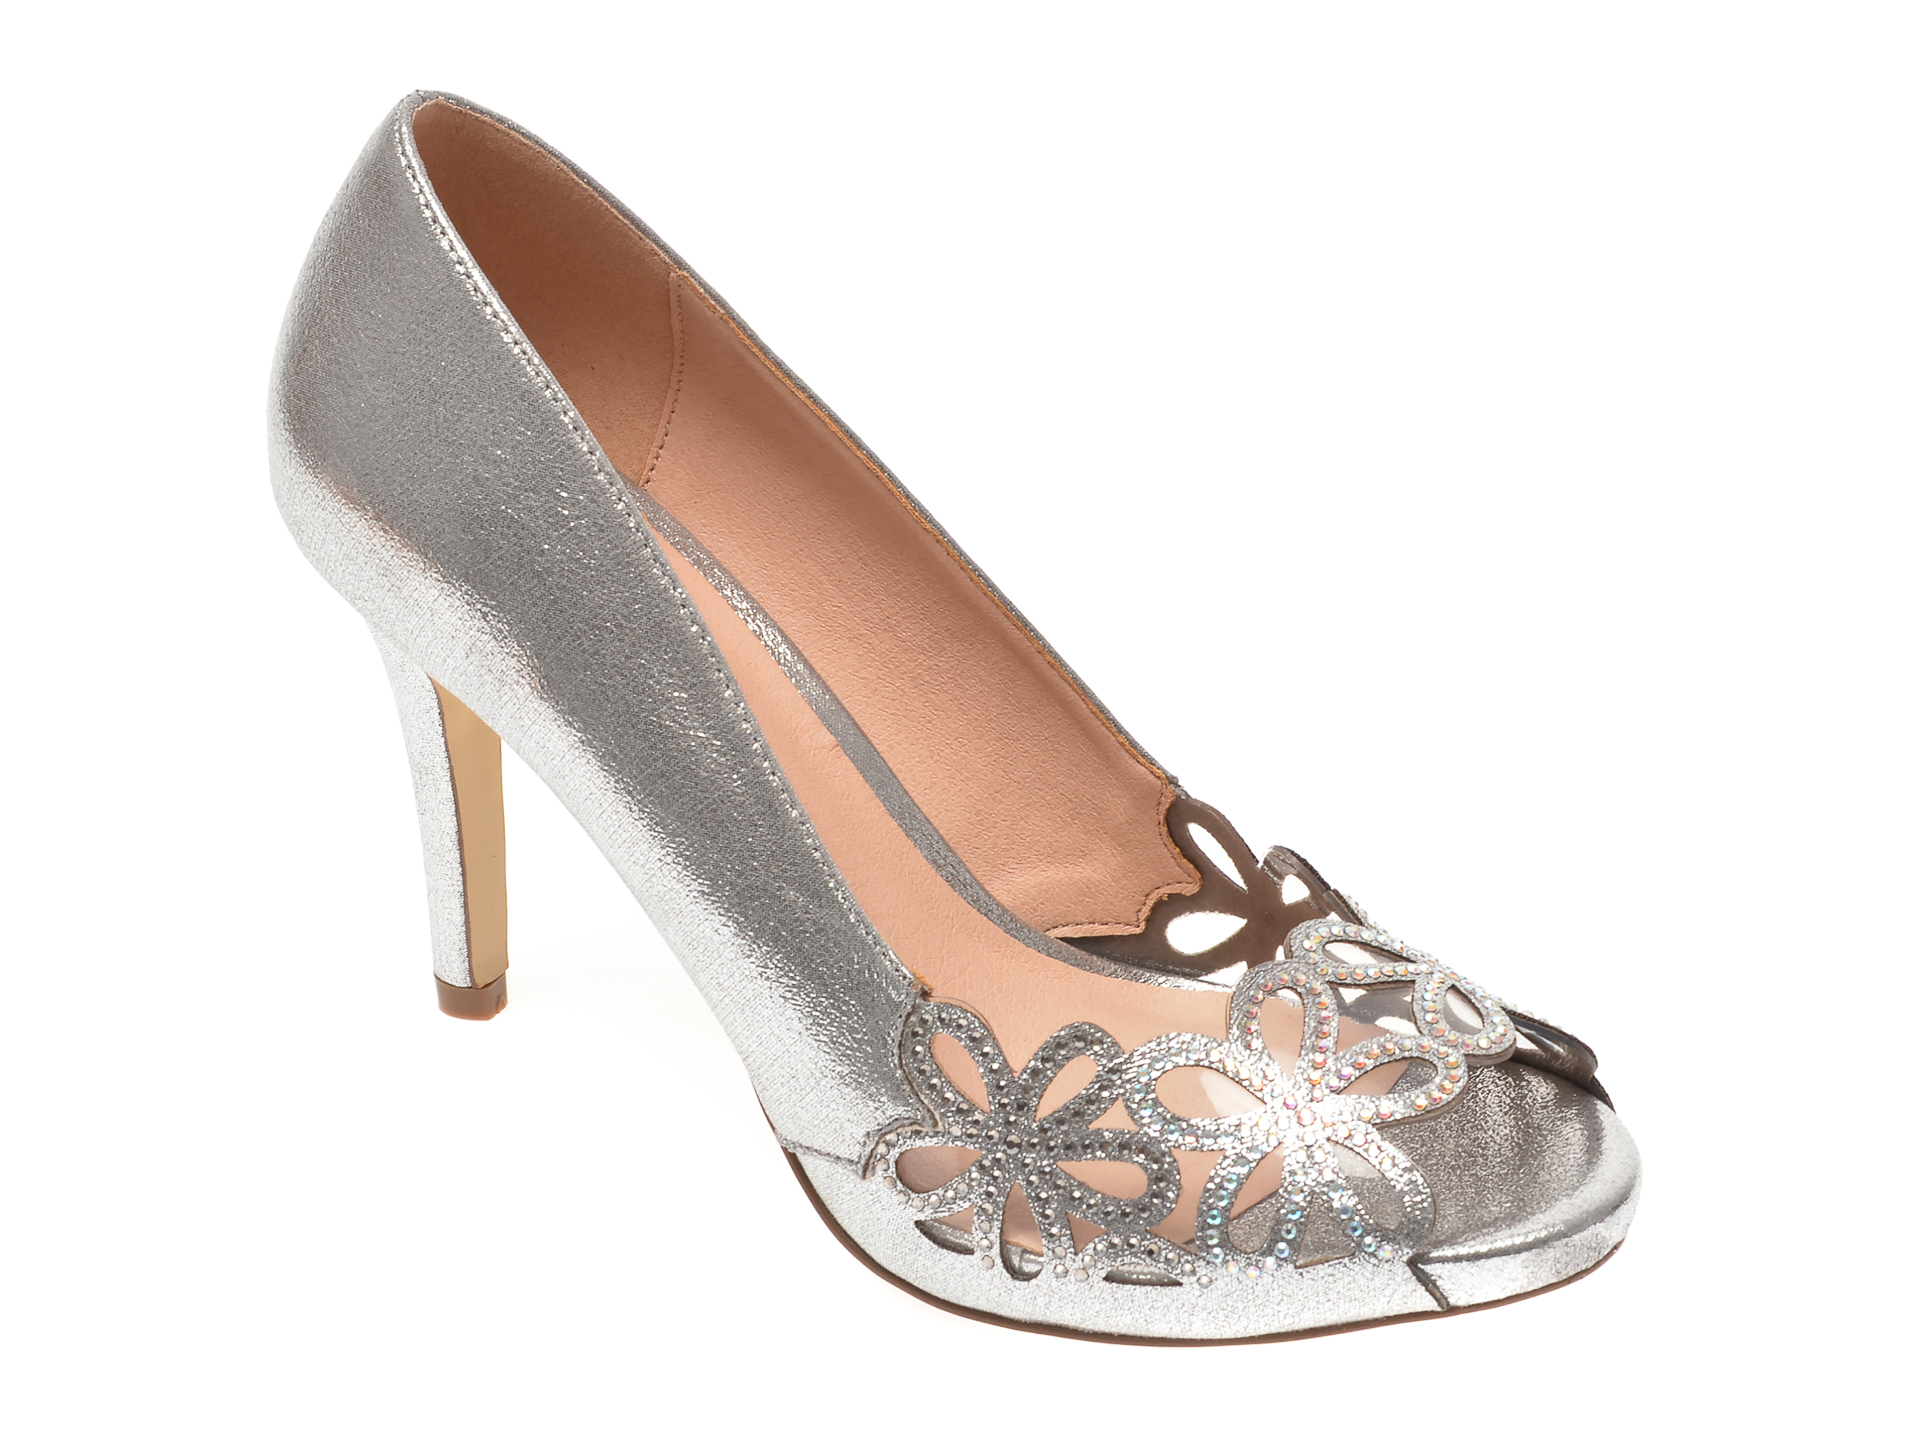 Pantofi MENBUR argintii, 21777, din piele ecologica imagine otter.ro 2021